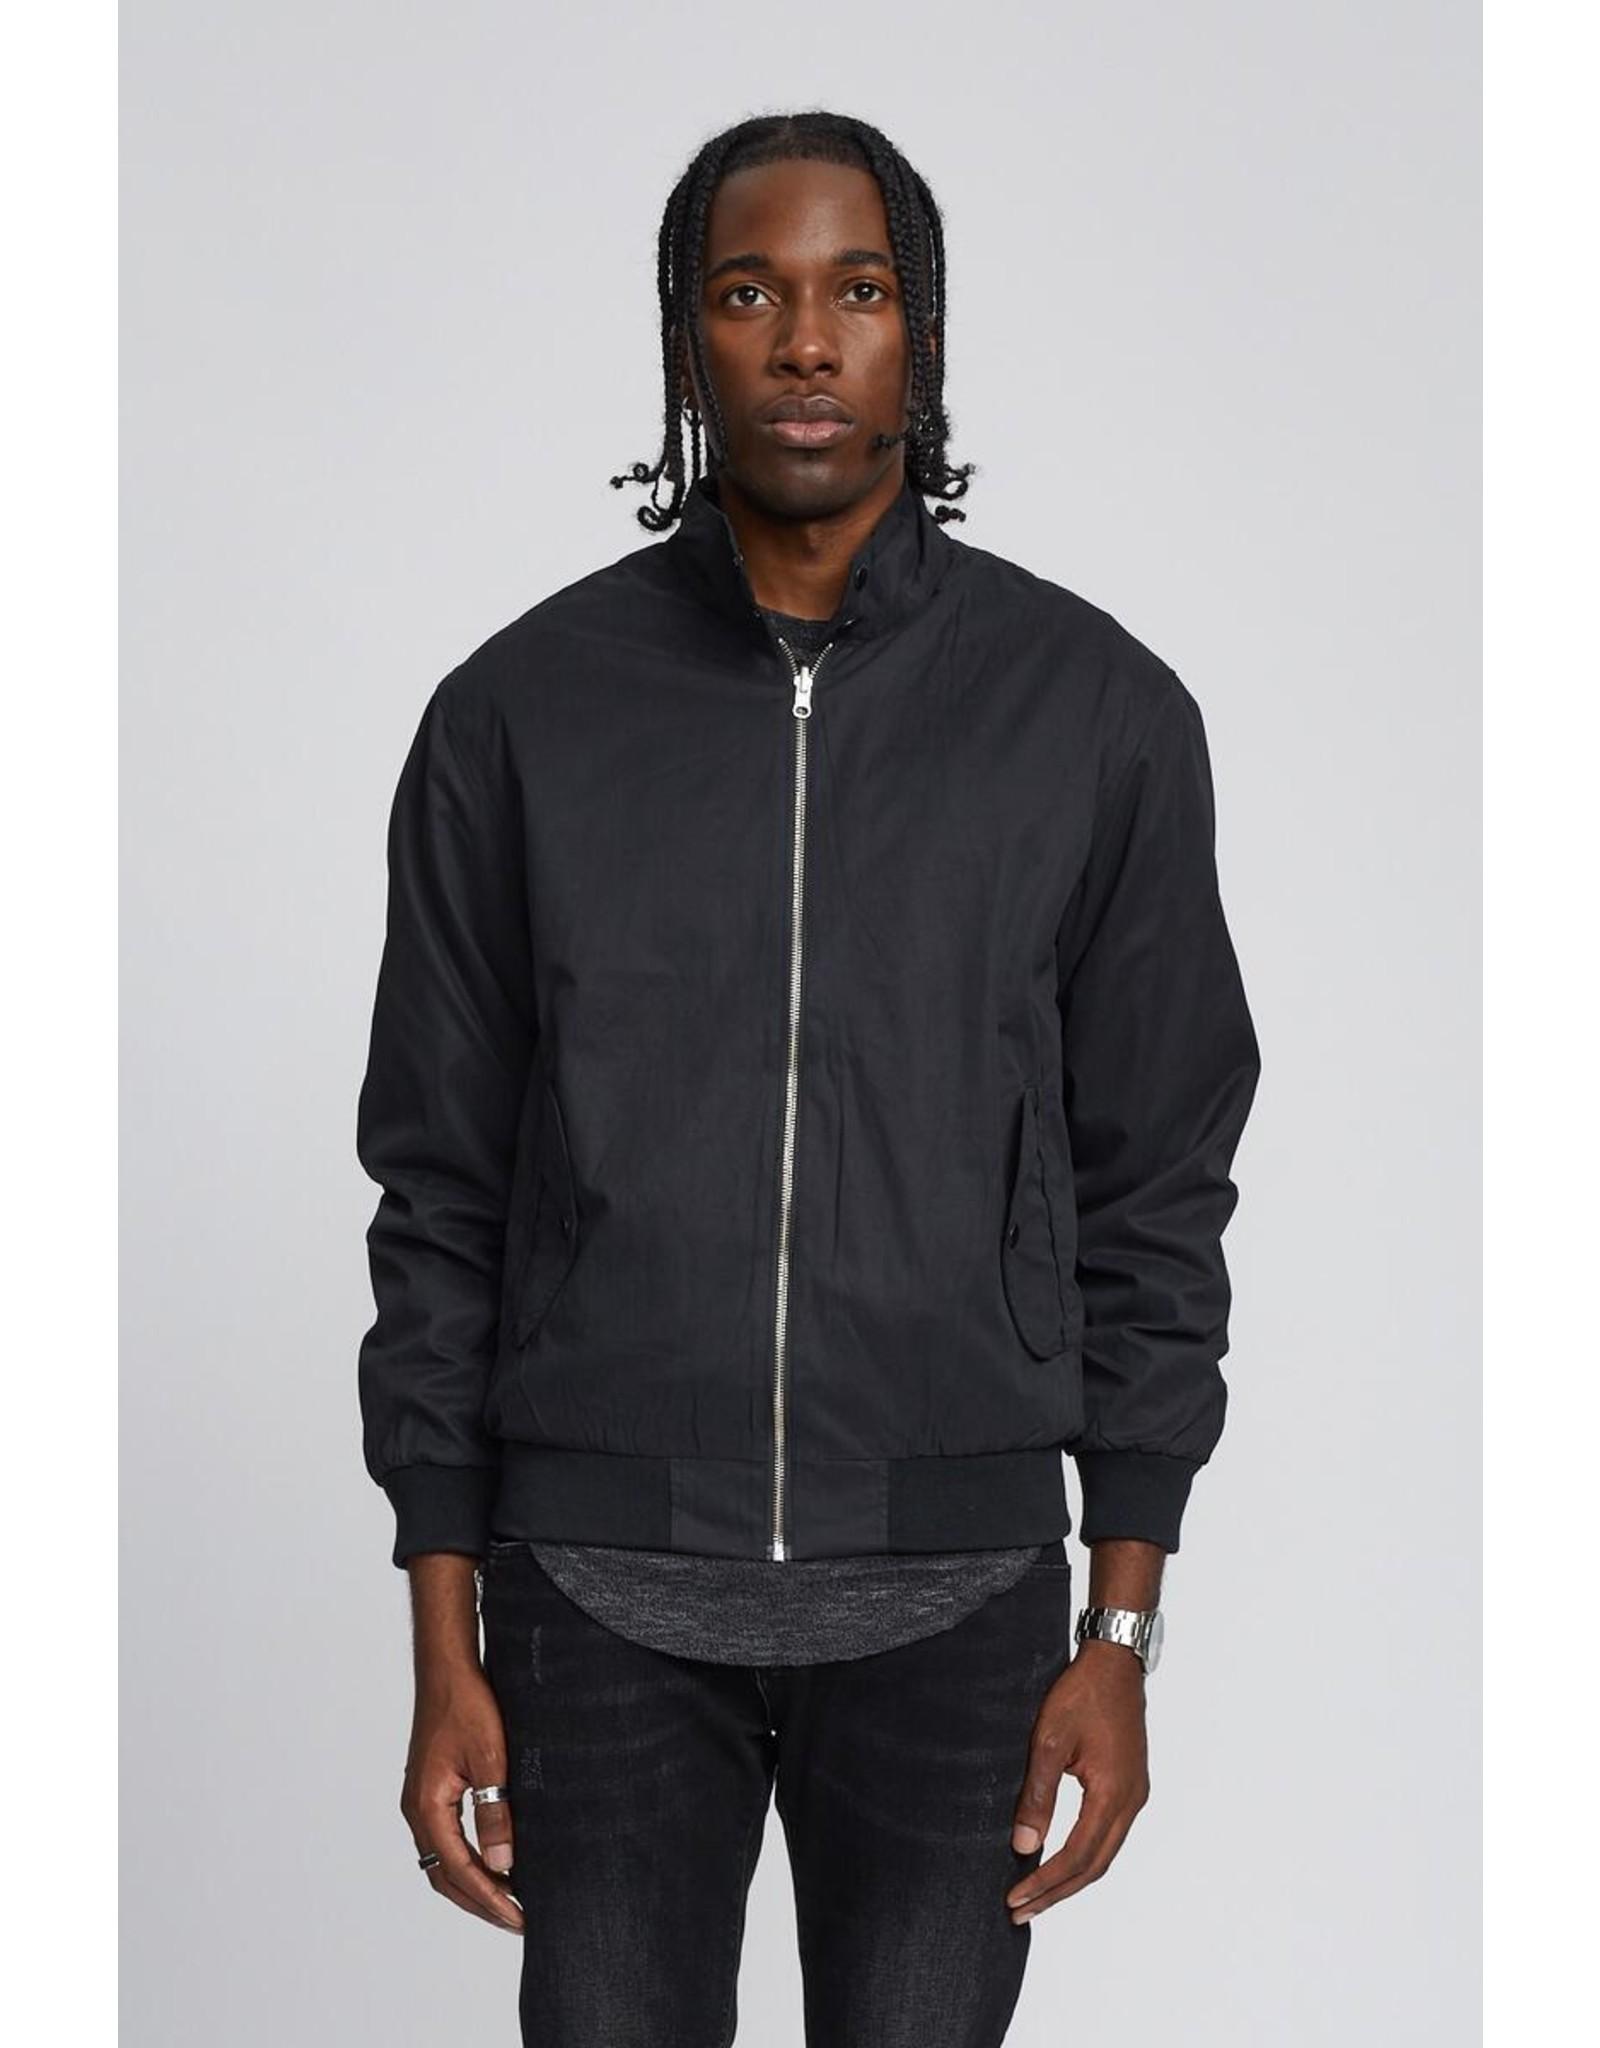 KUWALLA TEE KUWALLA Reversible Harrington Jacket